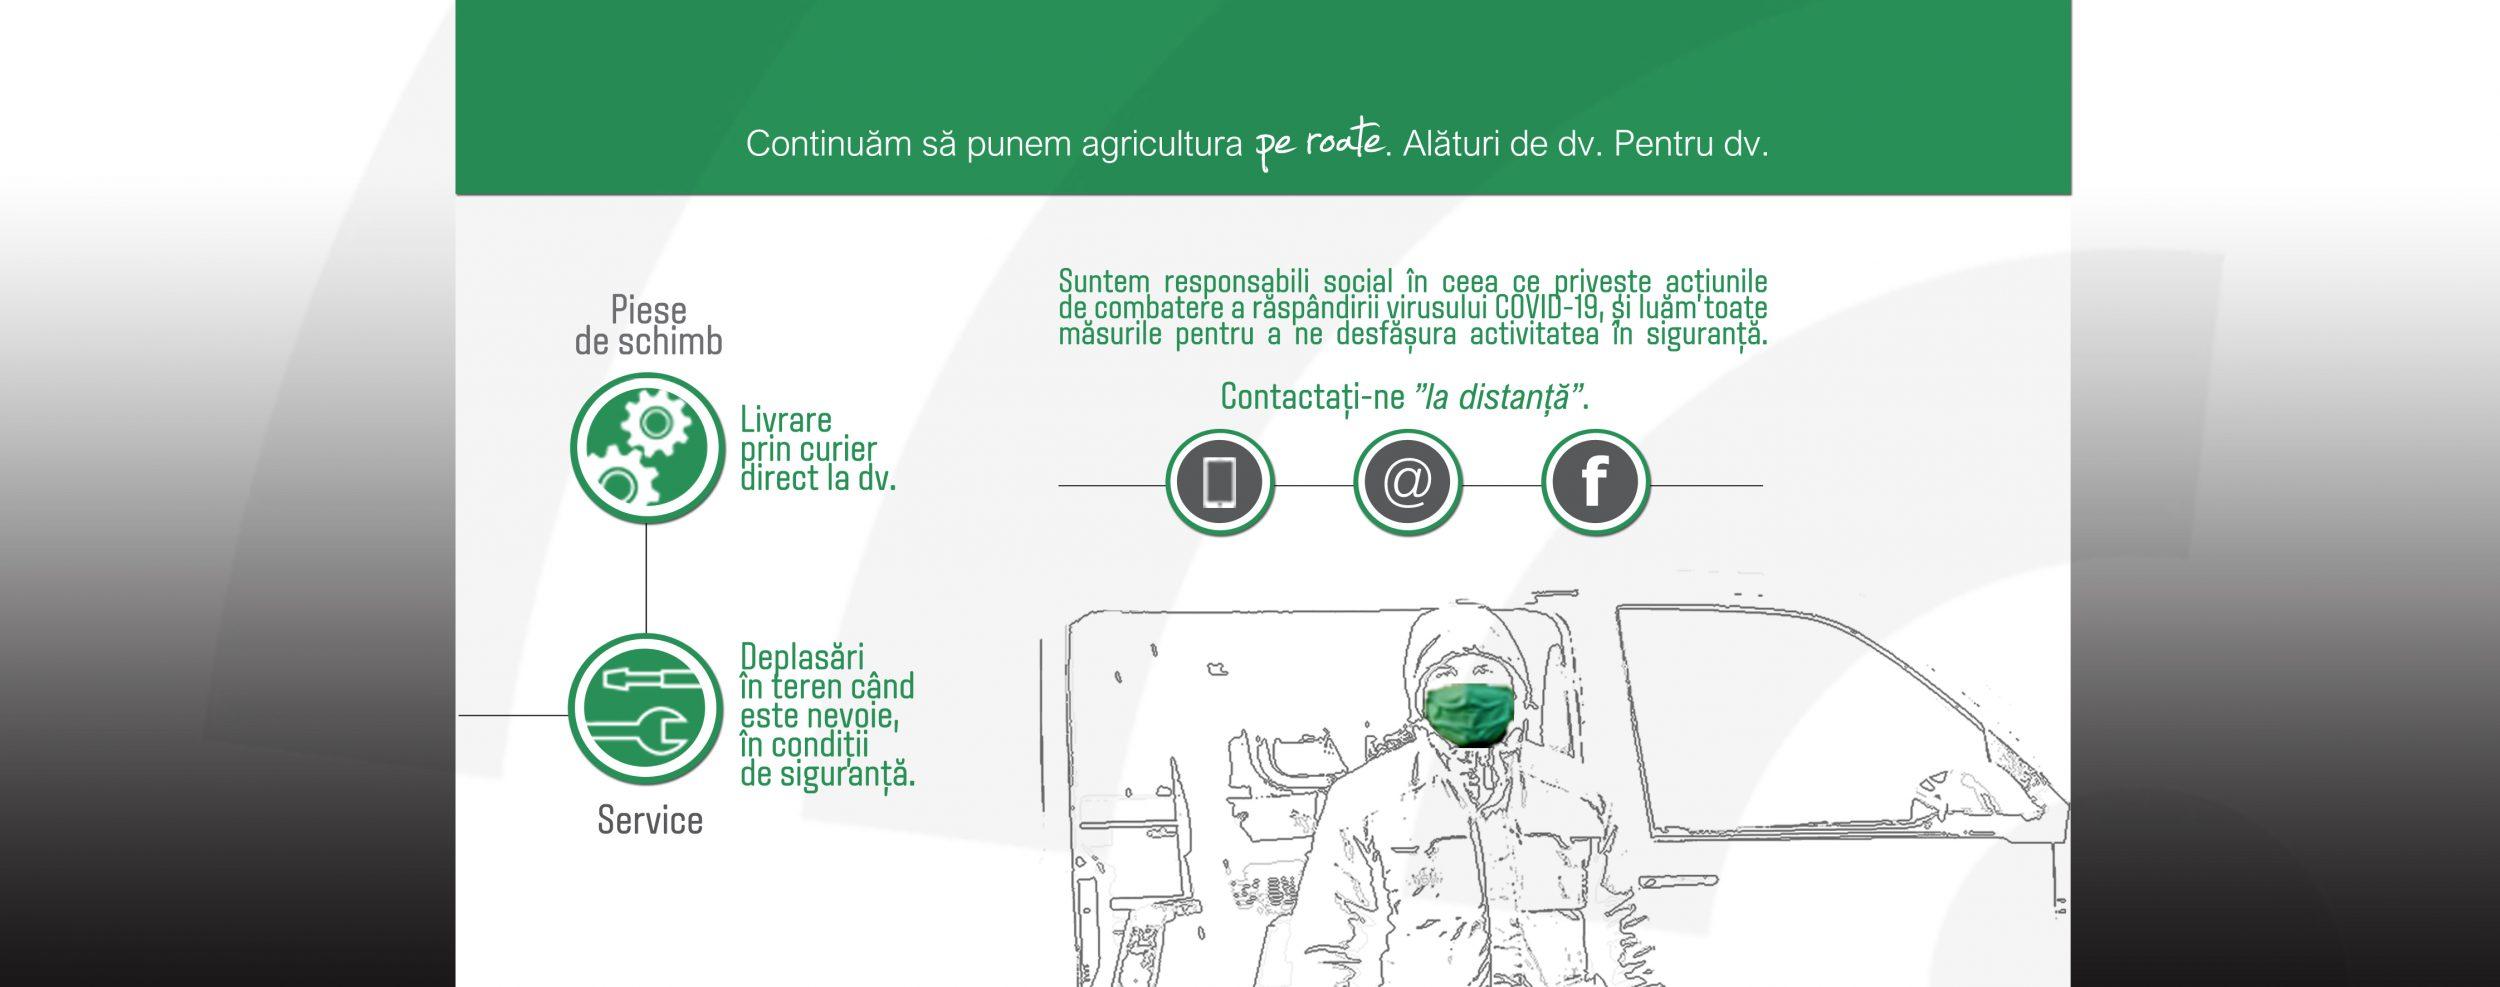 infografice livrare, servicii deplasare pe teren, responsabilitate COVID-19